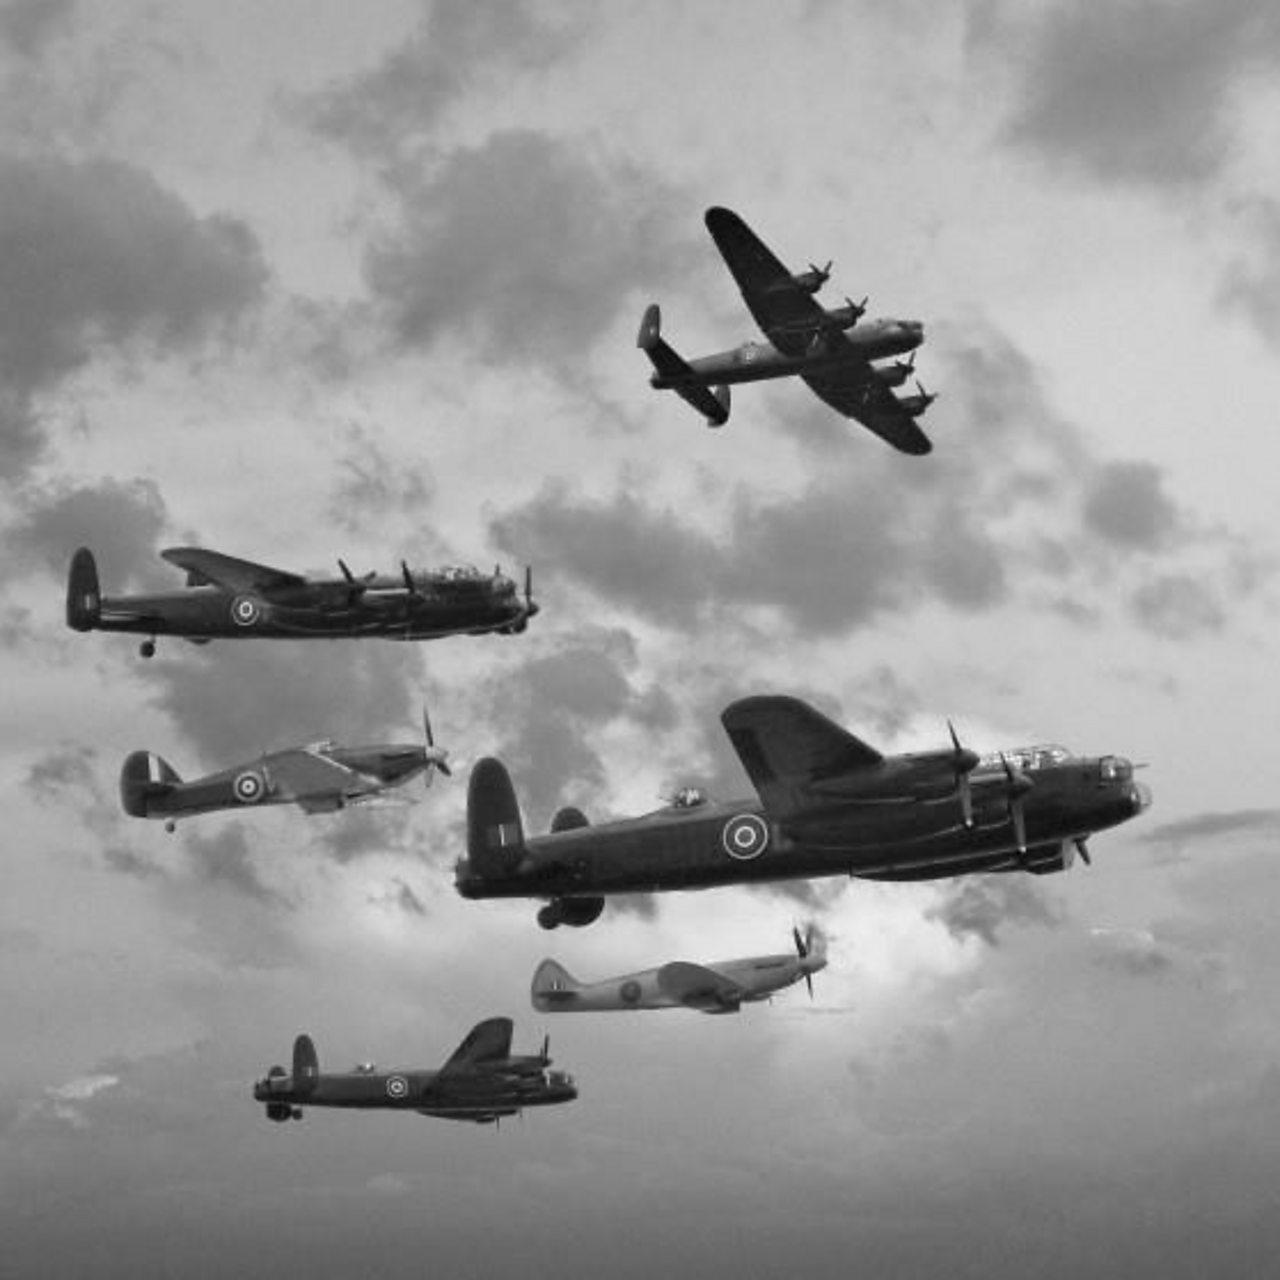 World War Two aircraft in flight.